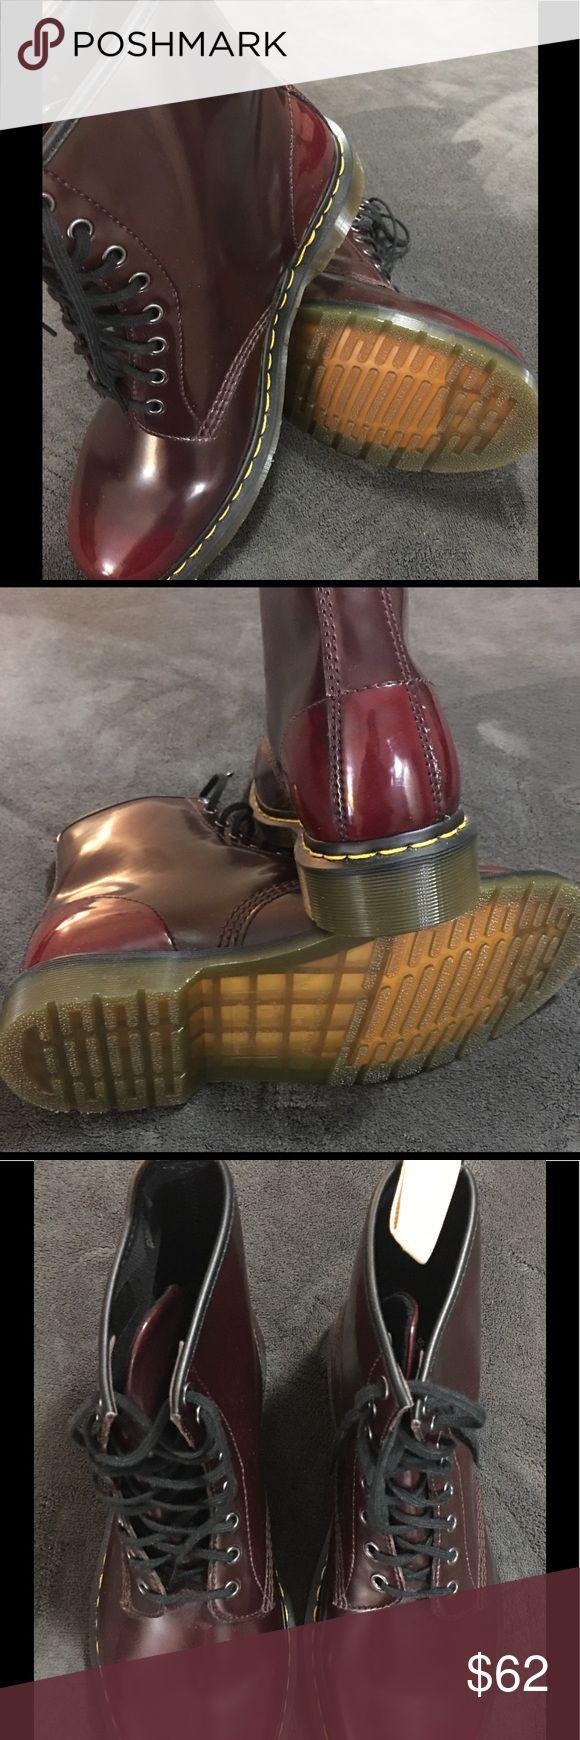 Men's Dr. Martens AirWair Boots NWOT Mens Dr. Marten lace up boots. Dark burgundy color. Dr. Martens Shoes Lace Up Boots